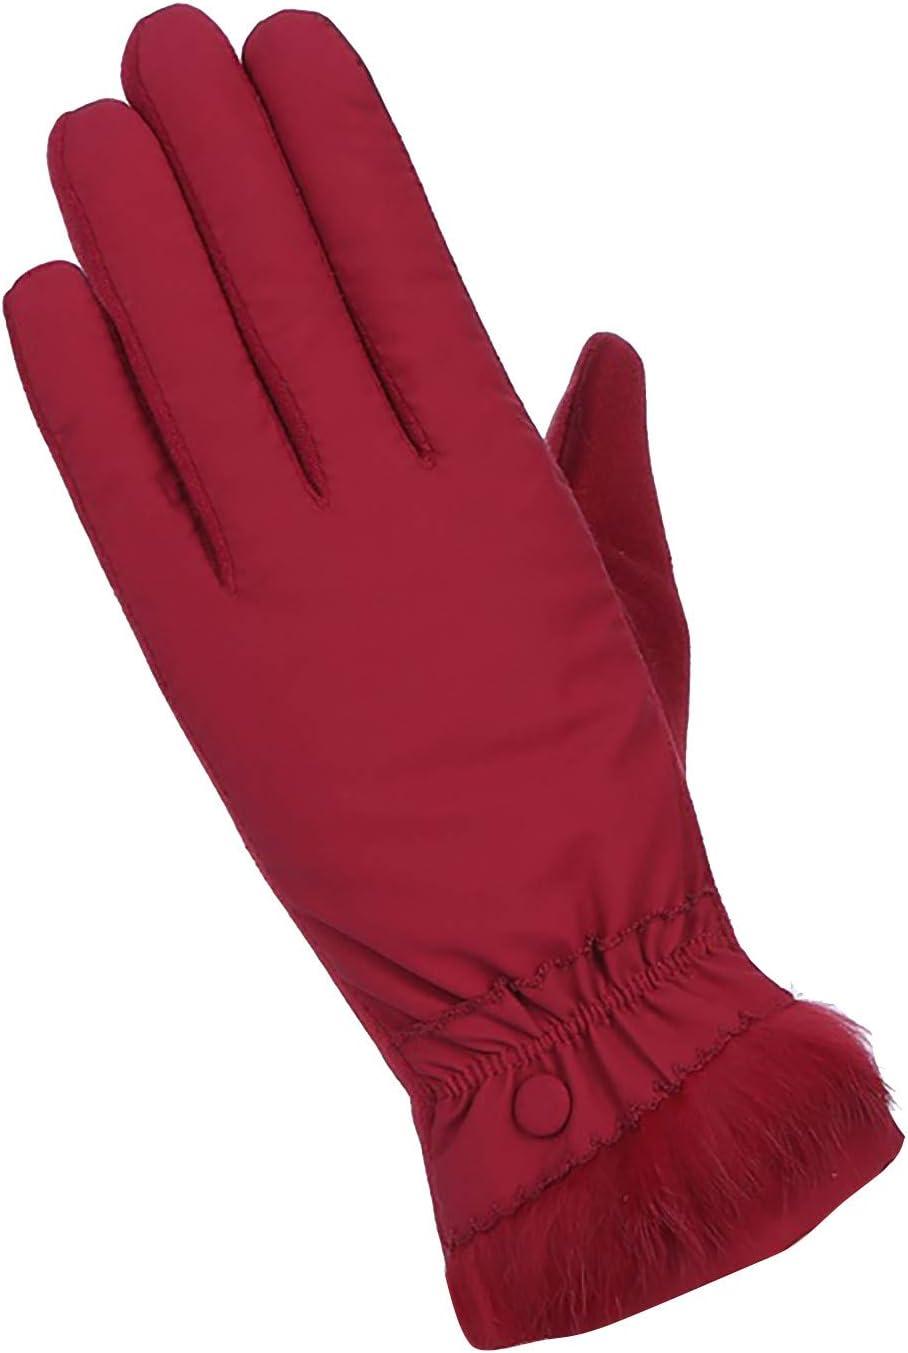 Sinifer Womens Winter Touchscreen Gloves Warm Lined Fingers Dual-layer Touch Screen Texting Mitten Rainproof Glove for Women (2-Red/Buttons)